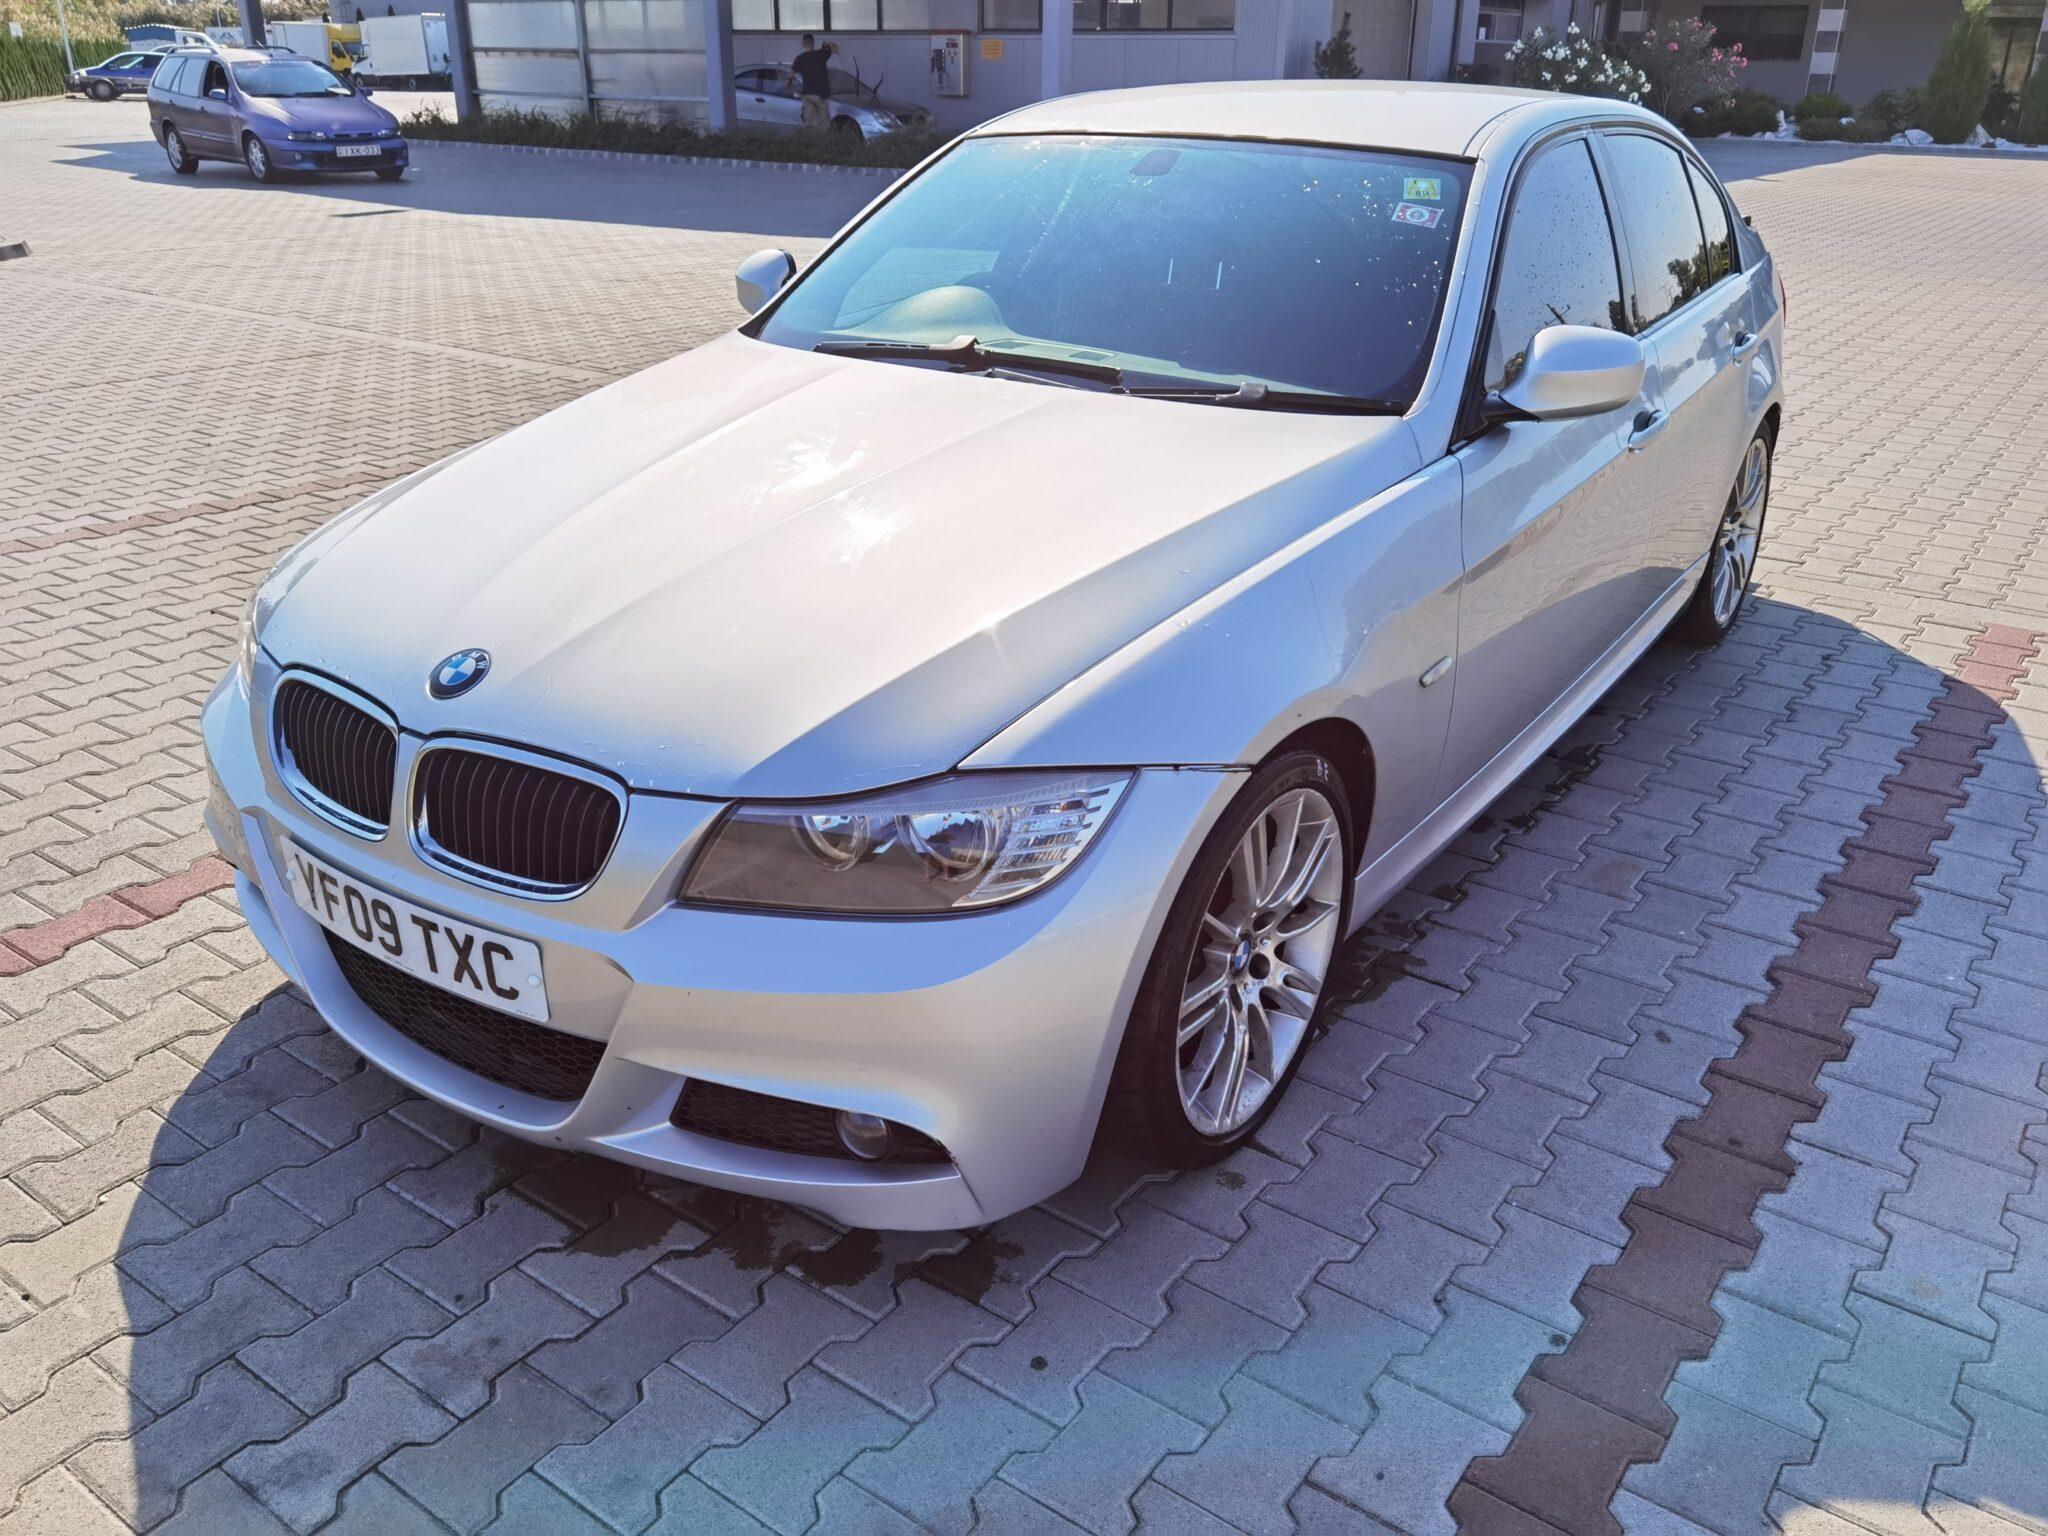 BMW E90 lci 318d Carbon Car Center Békéscsaba-12